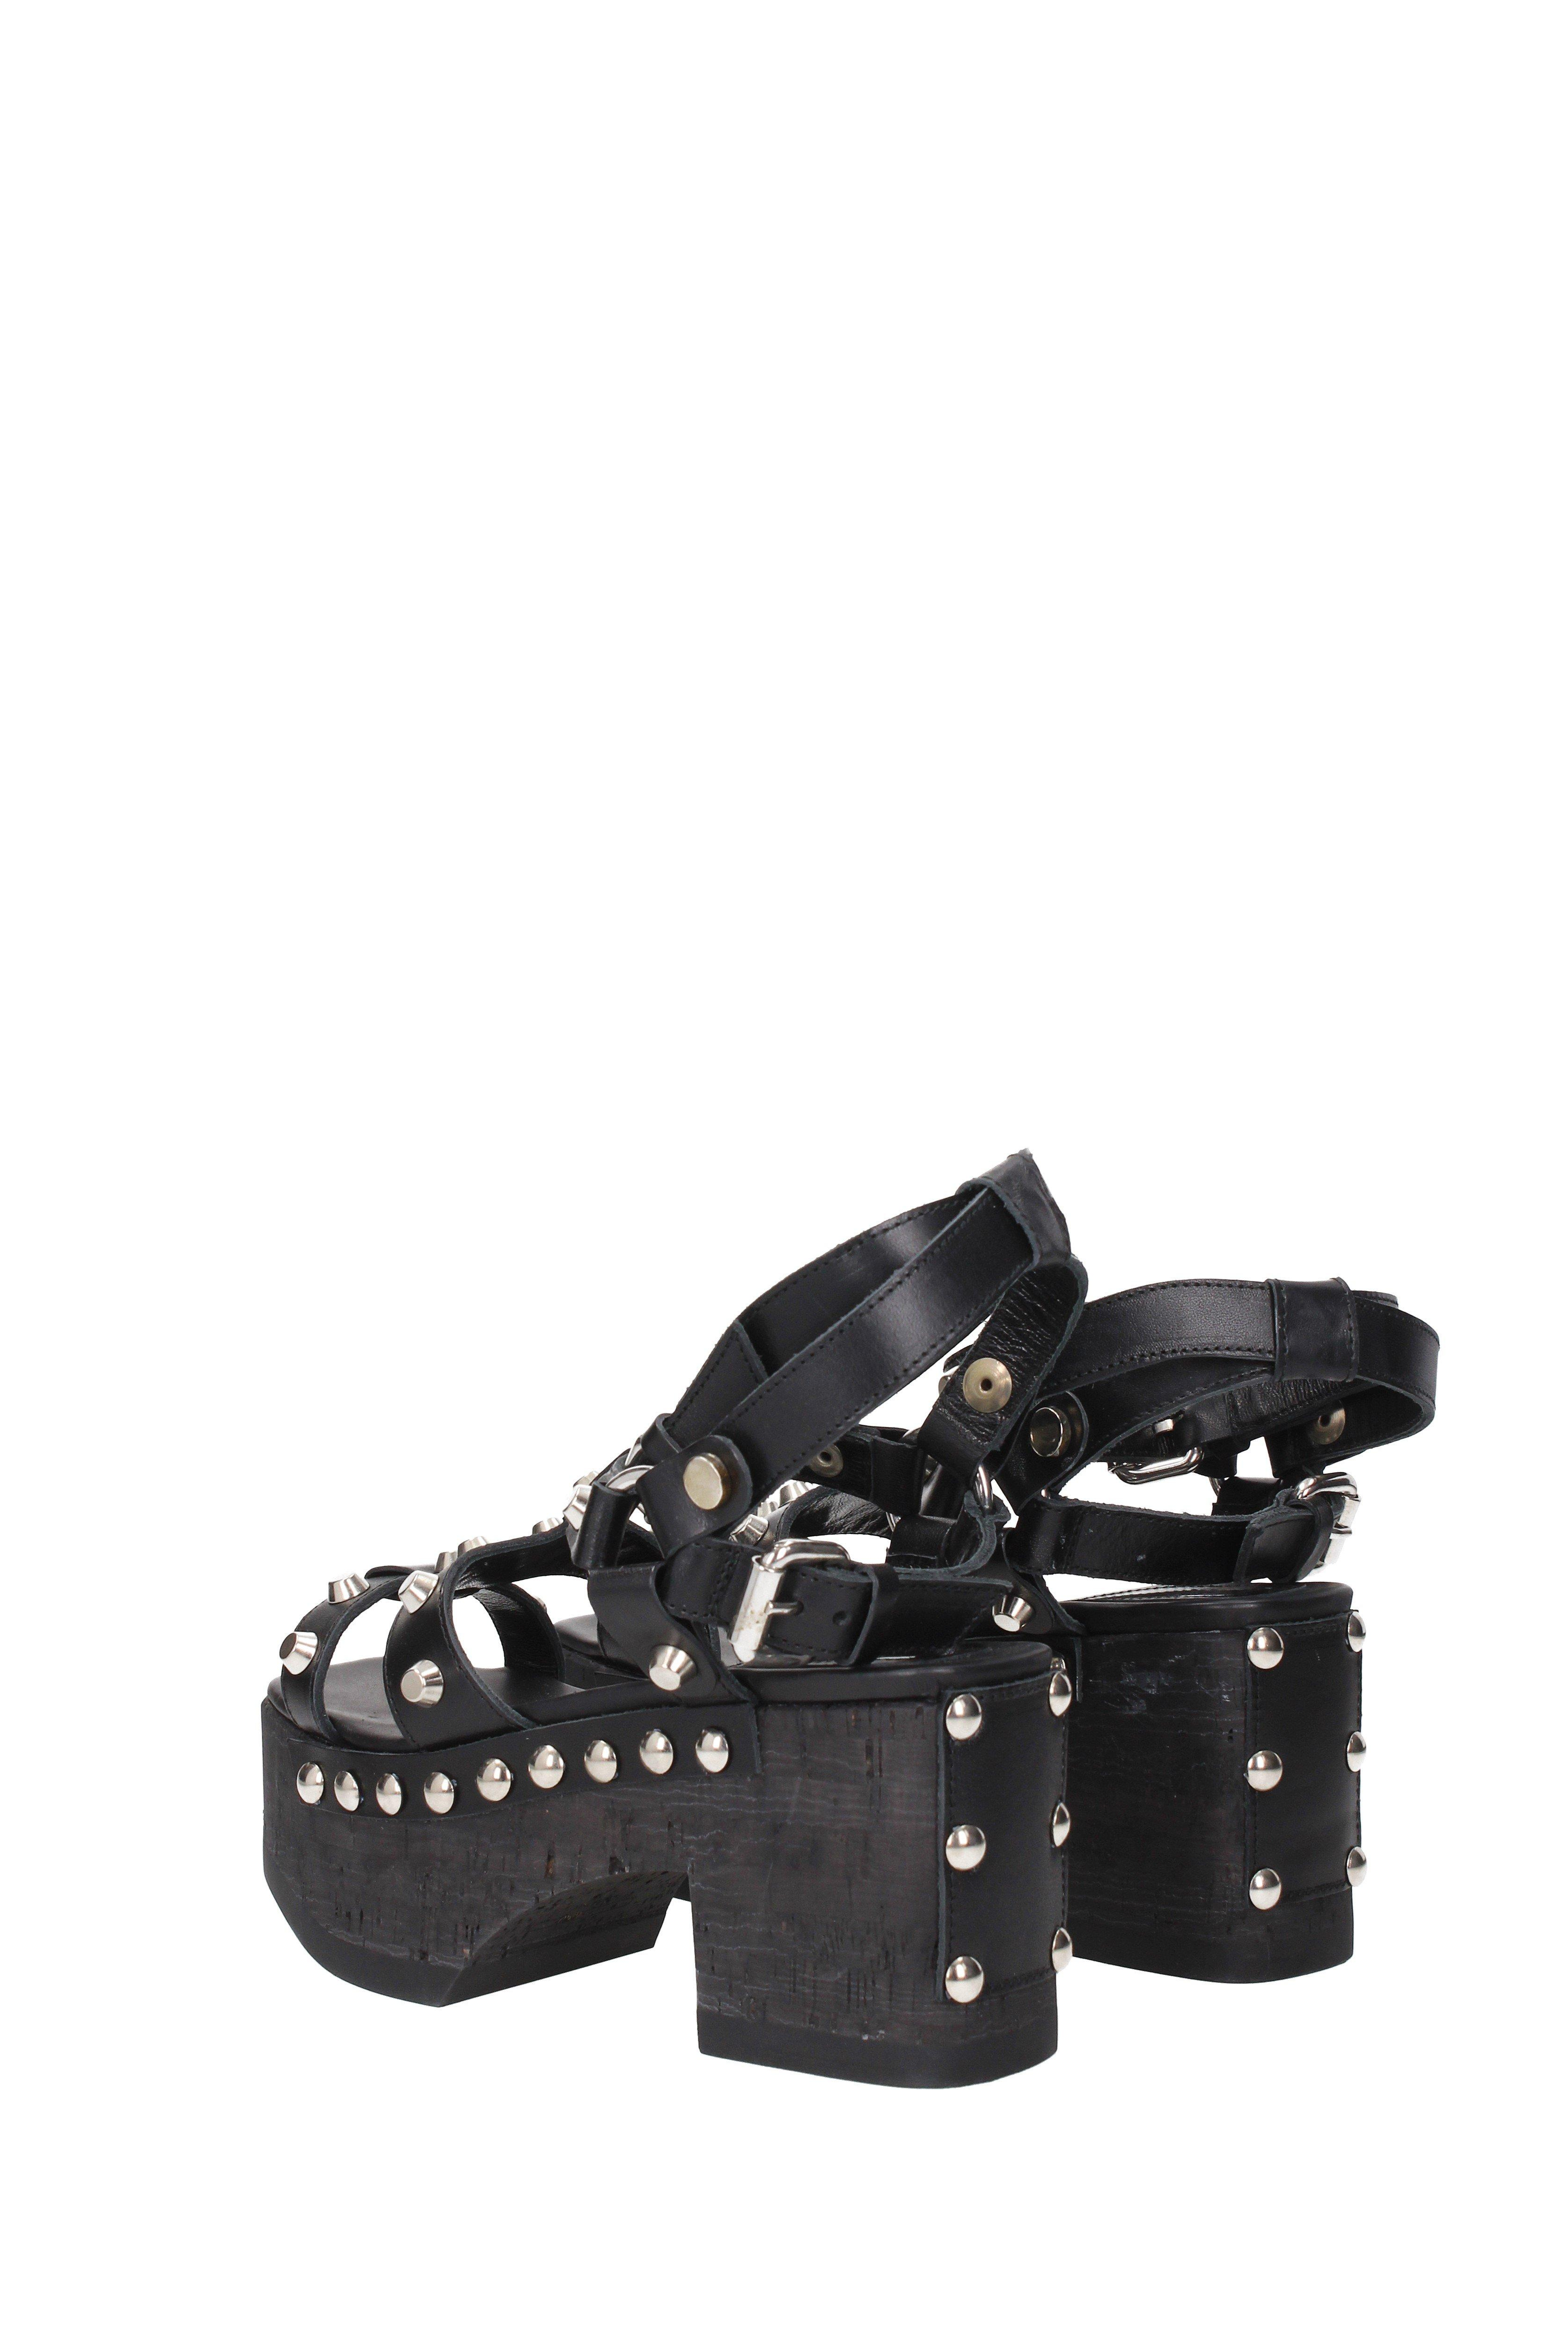 41223c15e000 Alexander McQueen - Sandals Paloma Gladiator Women Black - Lyst. View  fullscreen